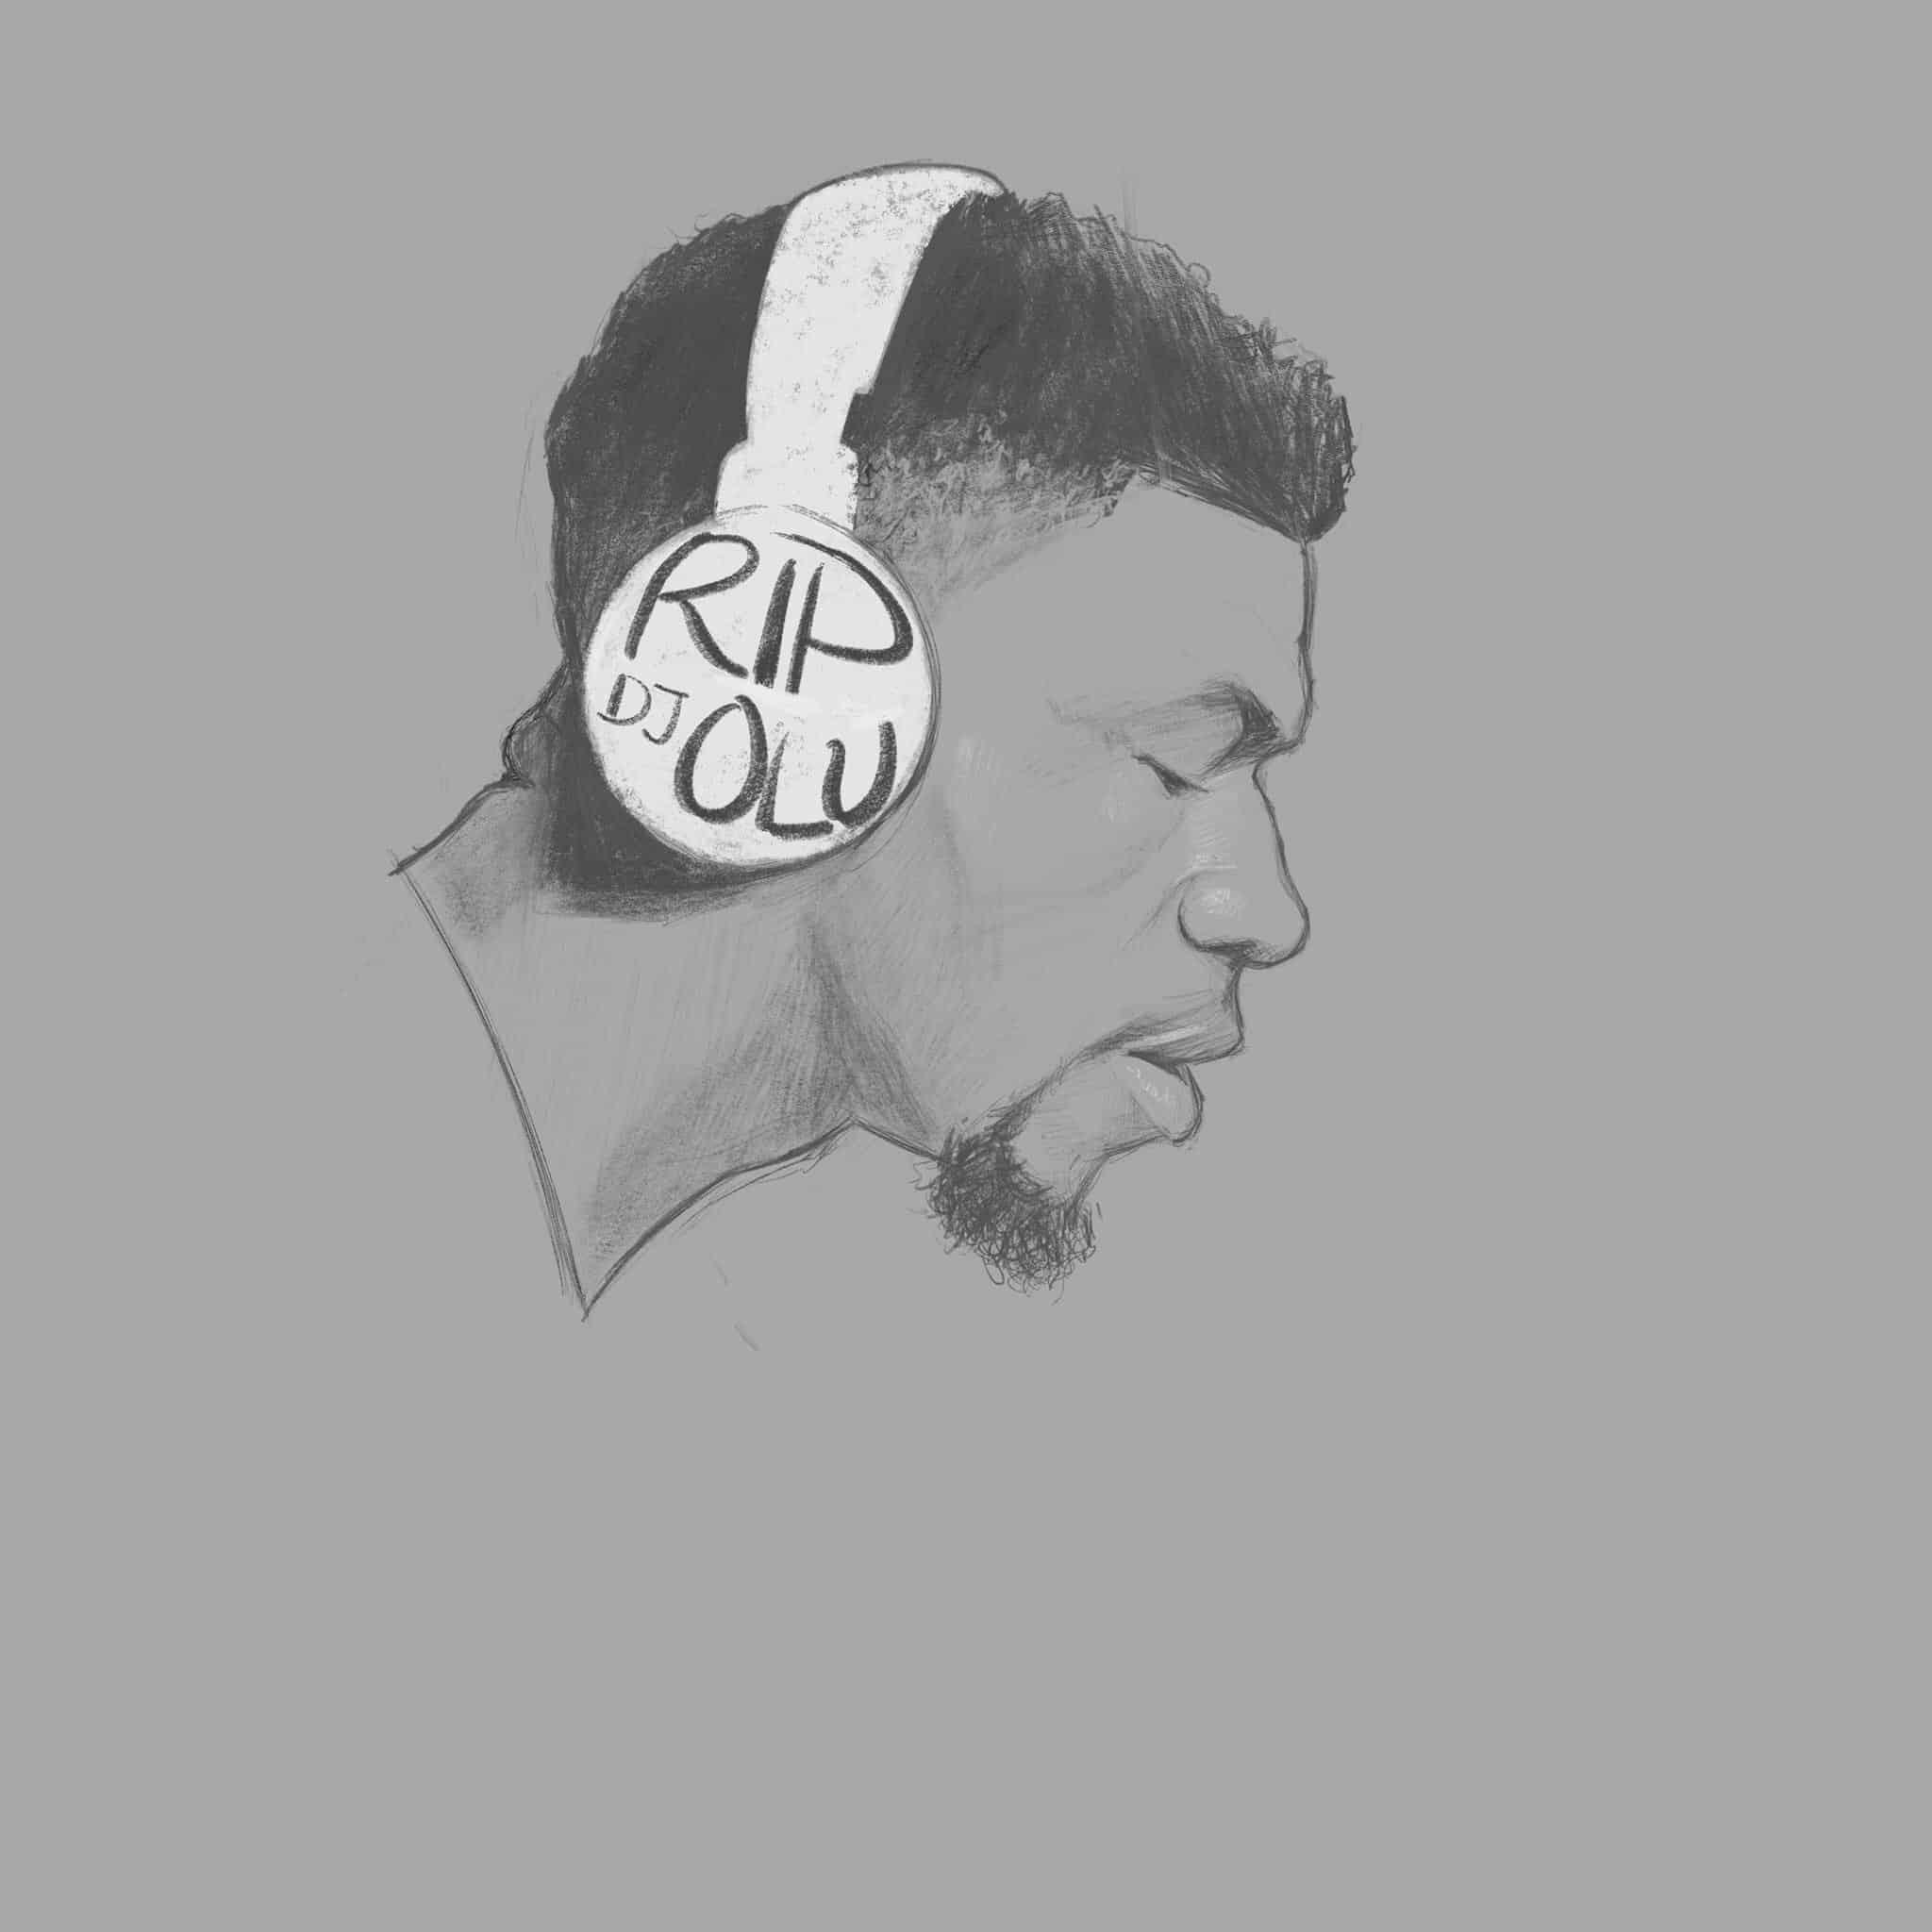 Artists Mourn The Passing Of DJ Olu On Social Media